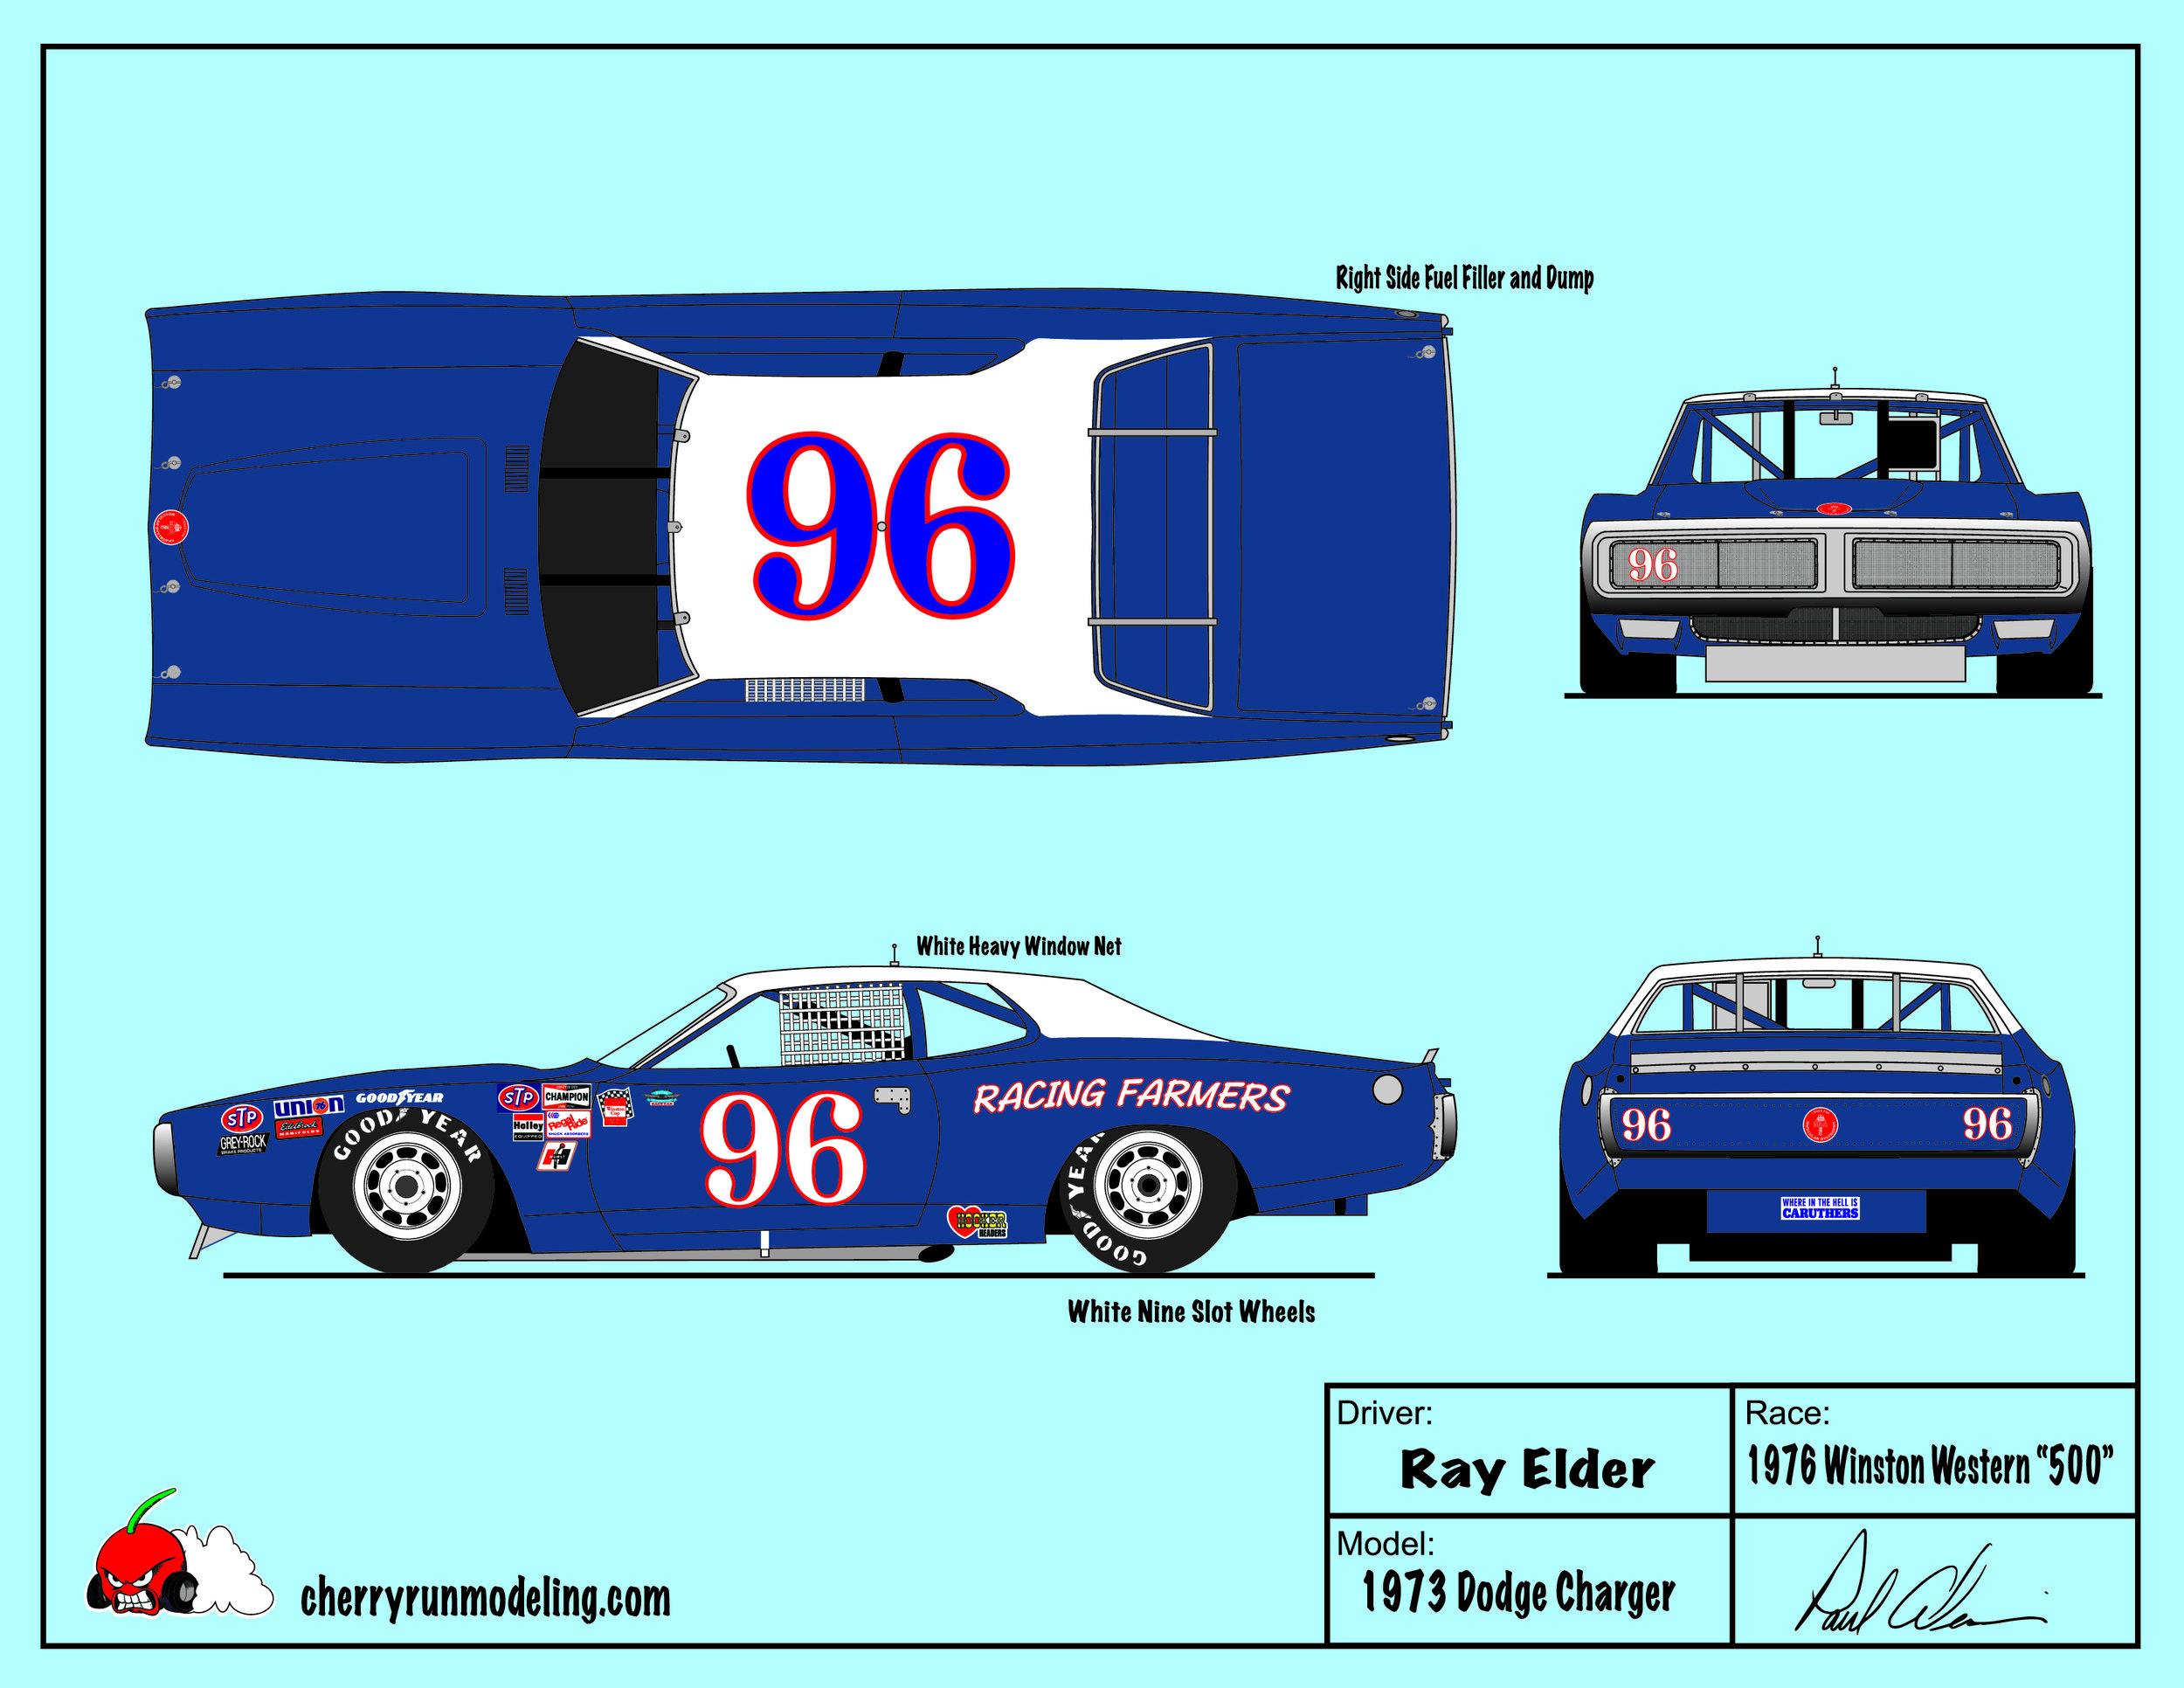 Ray Elder 1976 Winston Western 500.jpg